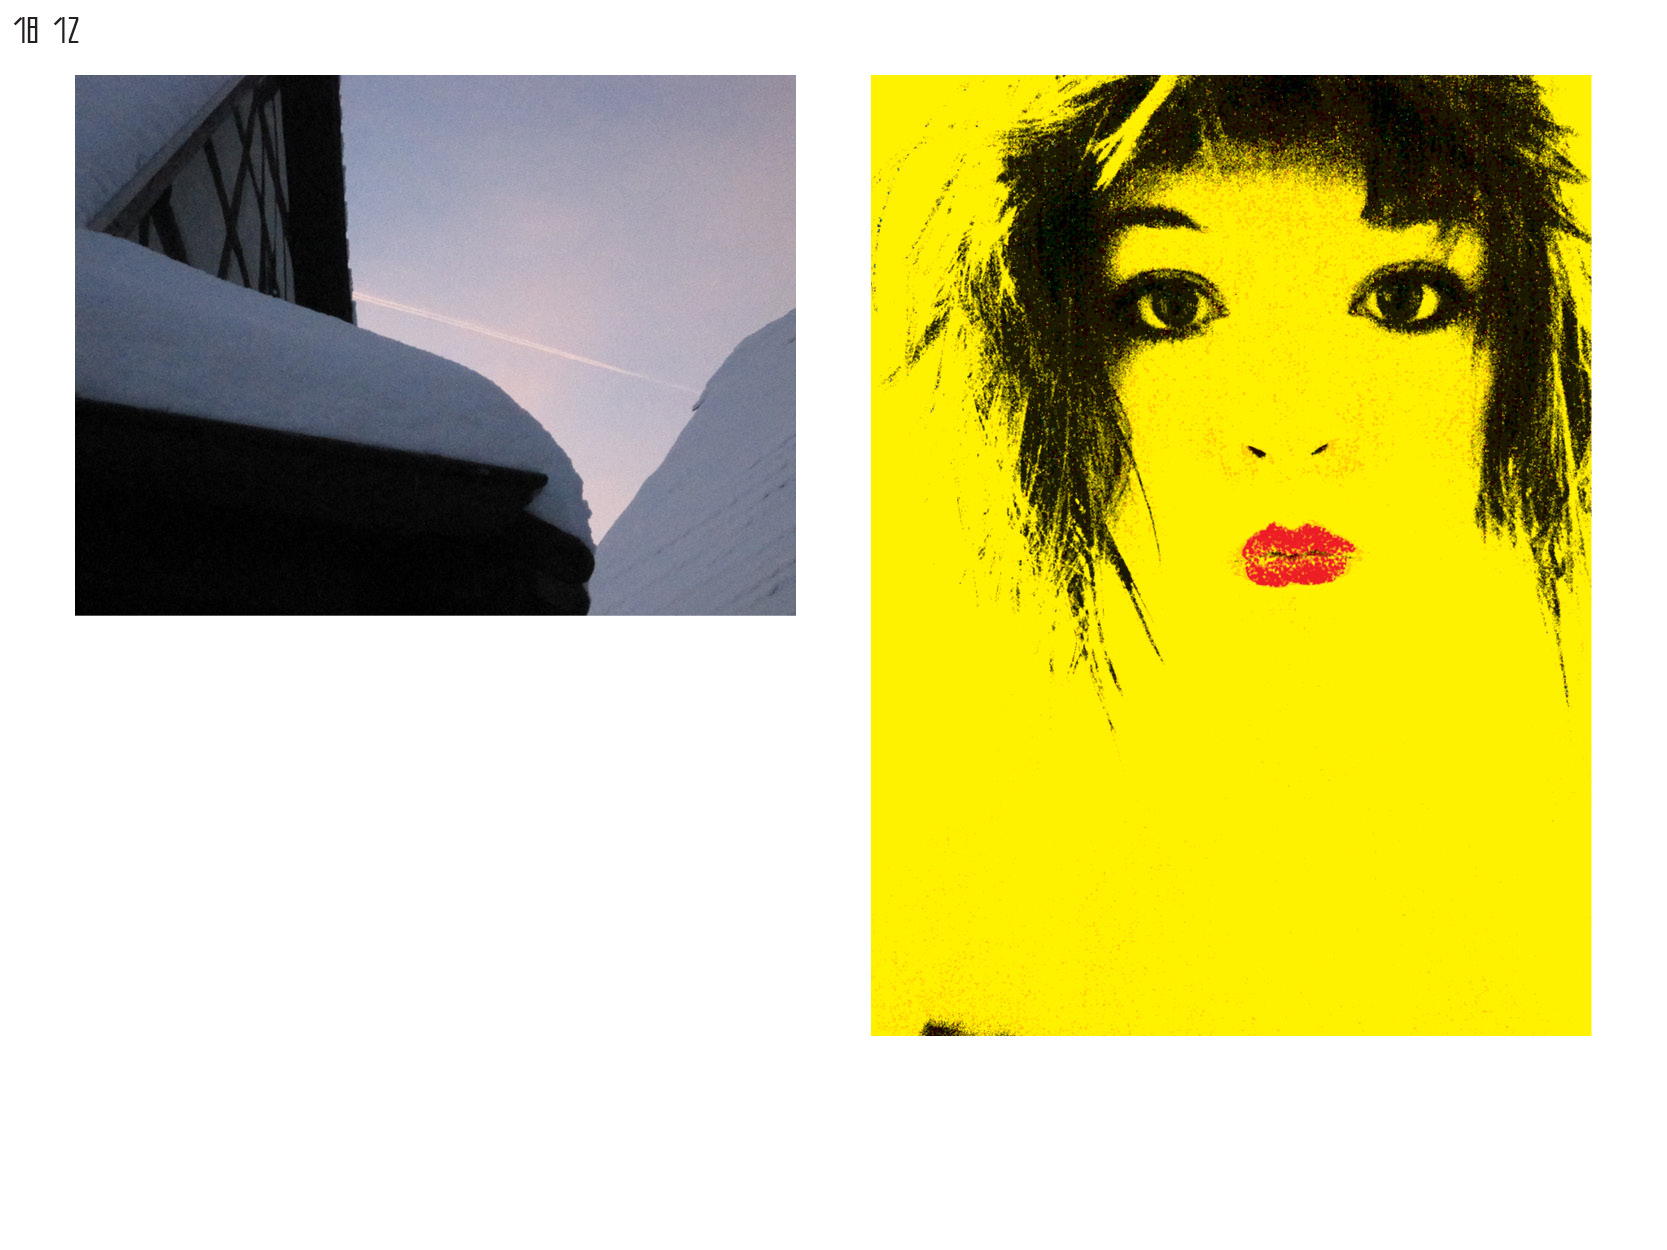 Gerrit-Schweiger-Dialog-Städte-Paris-Berlin-Jessica-Blank-Experiment-Fotoserie-Tagebuch-visuelle-Kommunikation-59